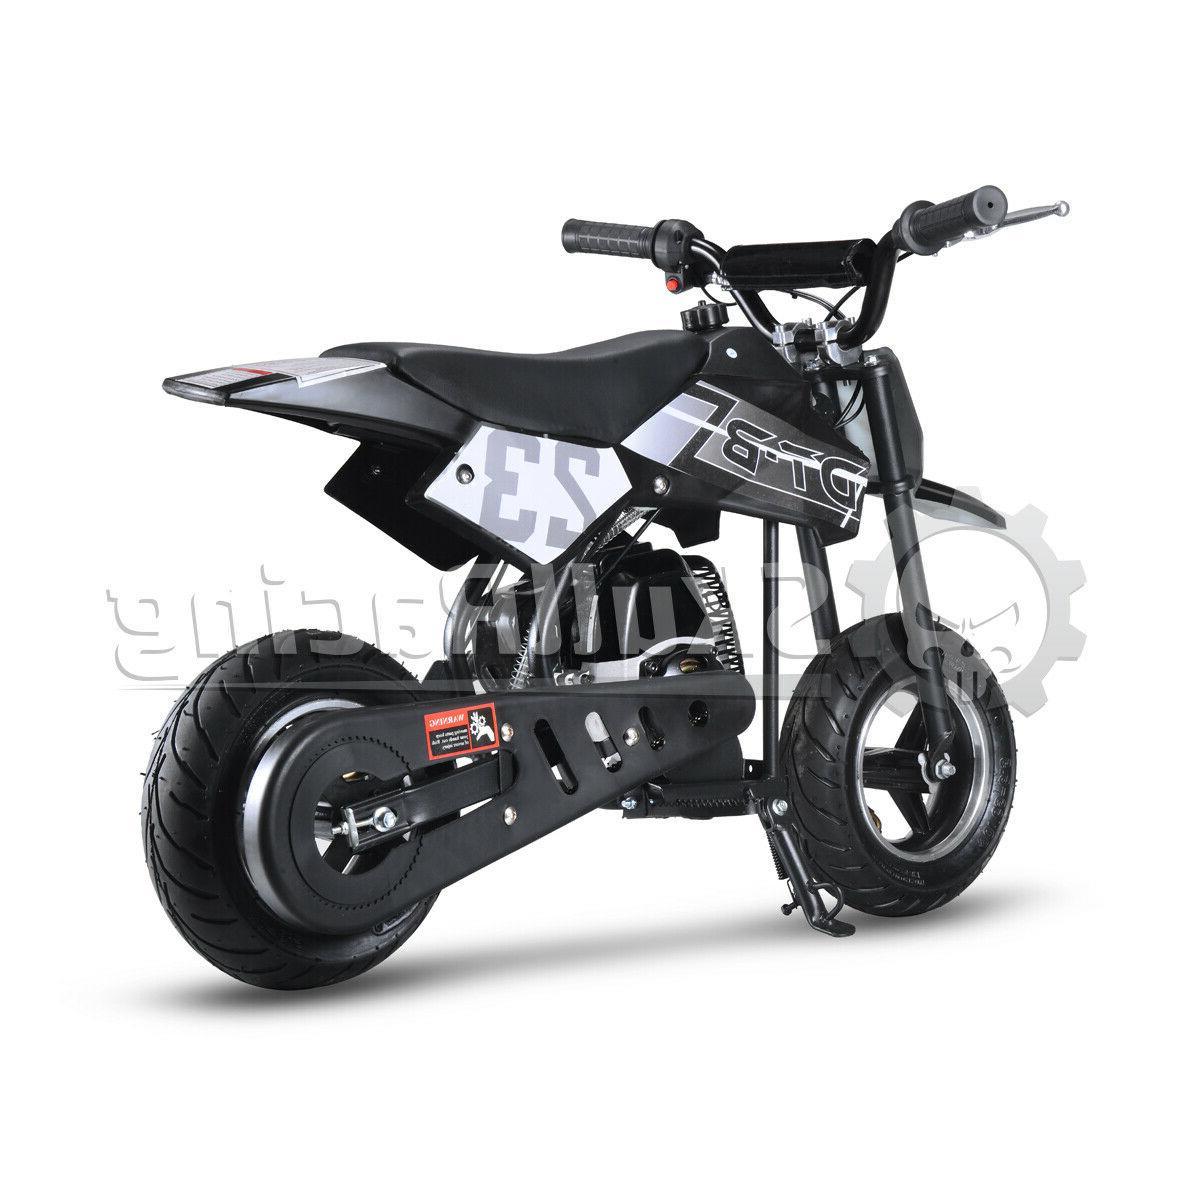 SkullRacing Mini Motorcycle